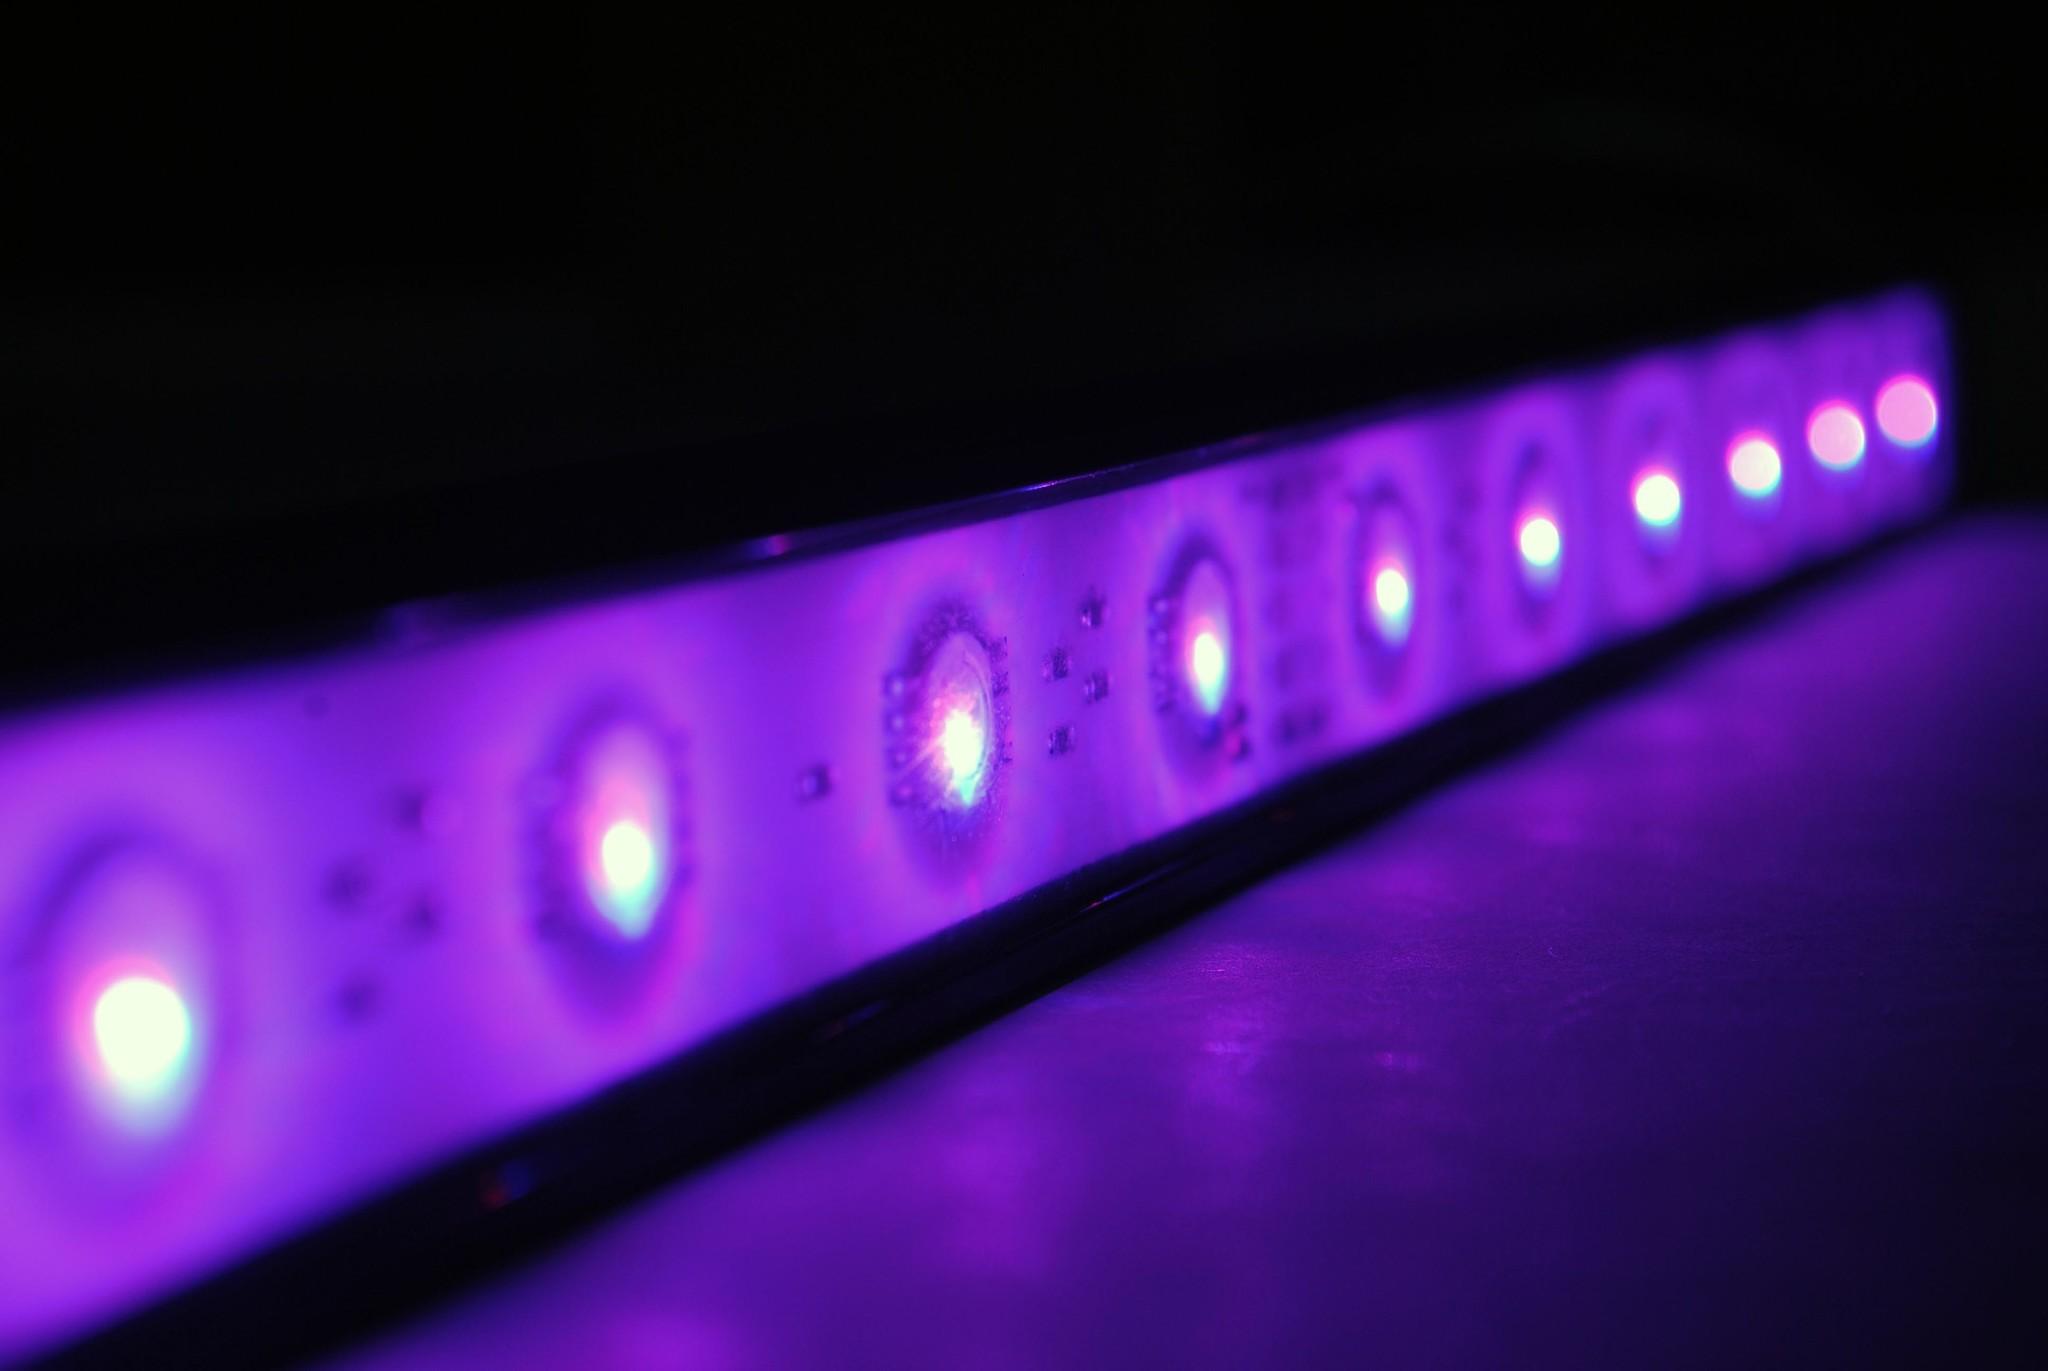 LEDBAR PRO 50 cm RGBWW IP68 Waterproof 12W 24V